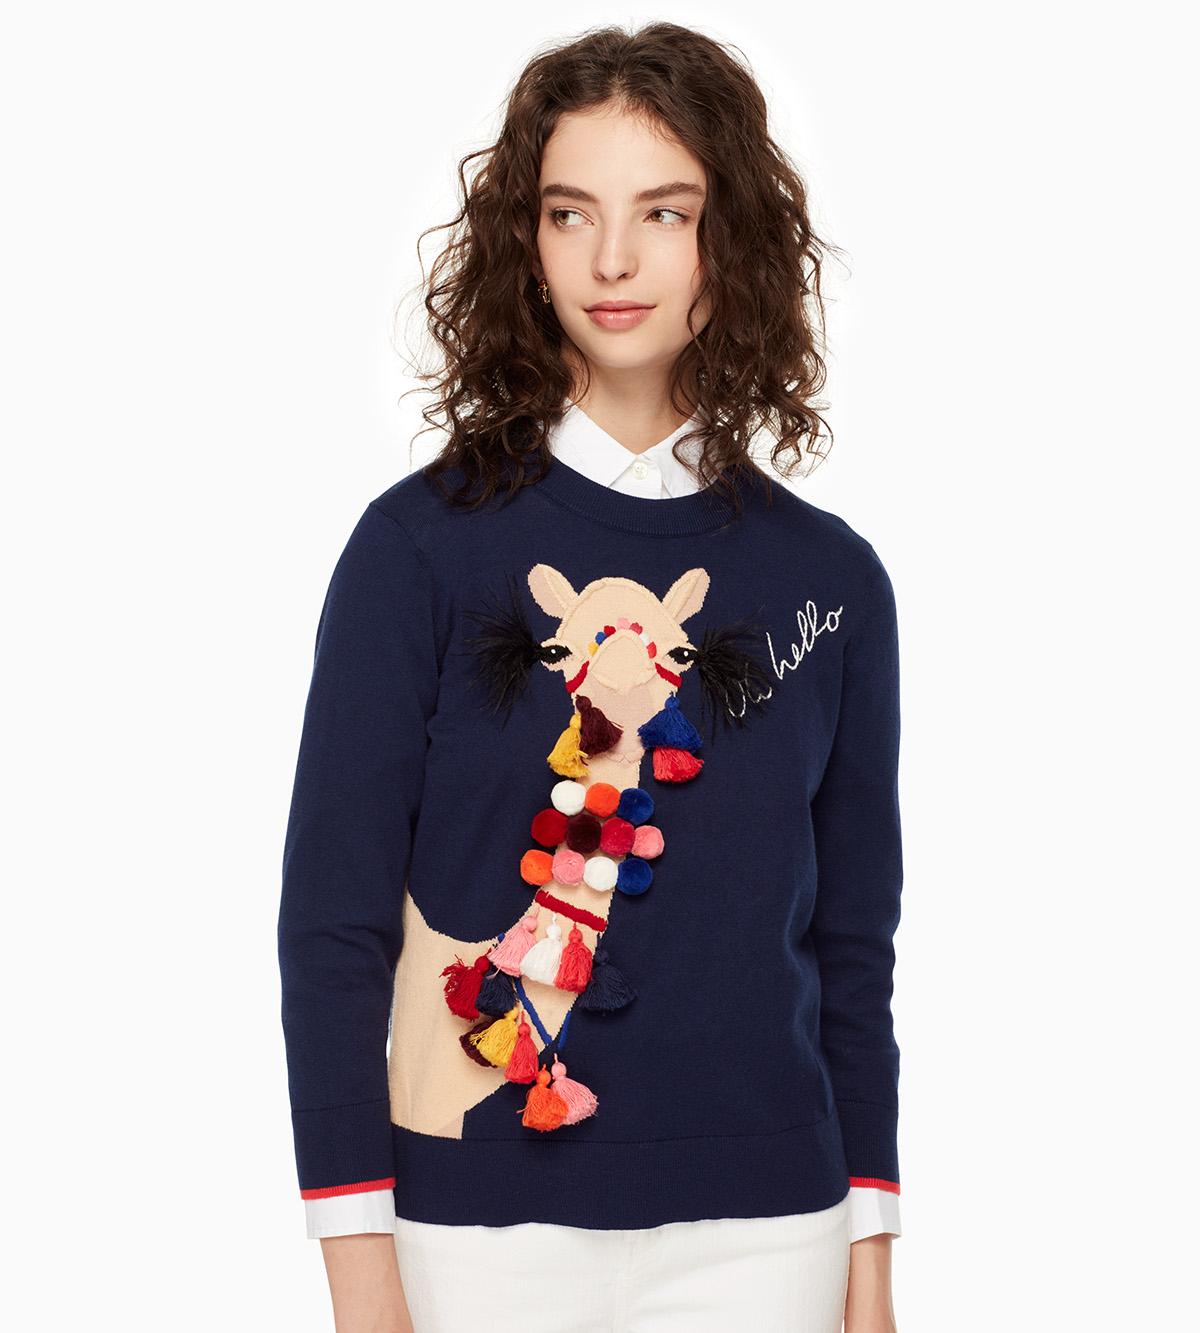 Camel_Sweater.jpg